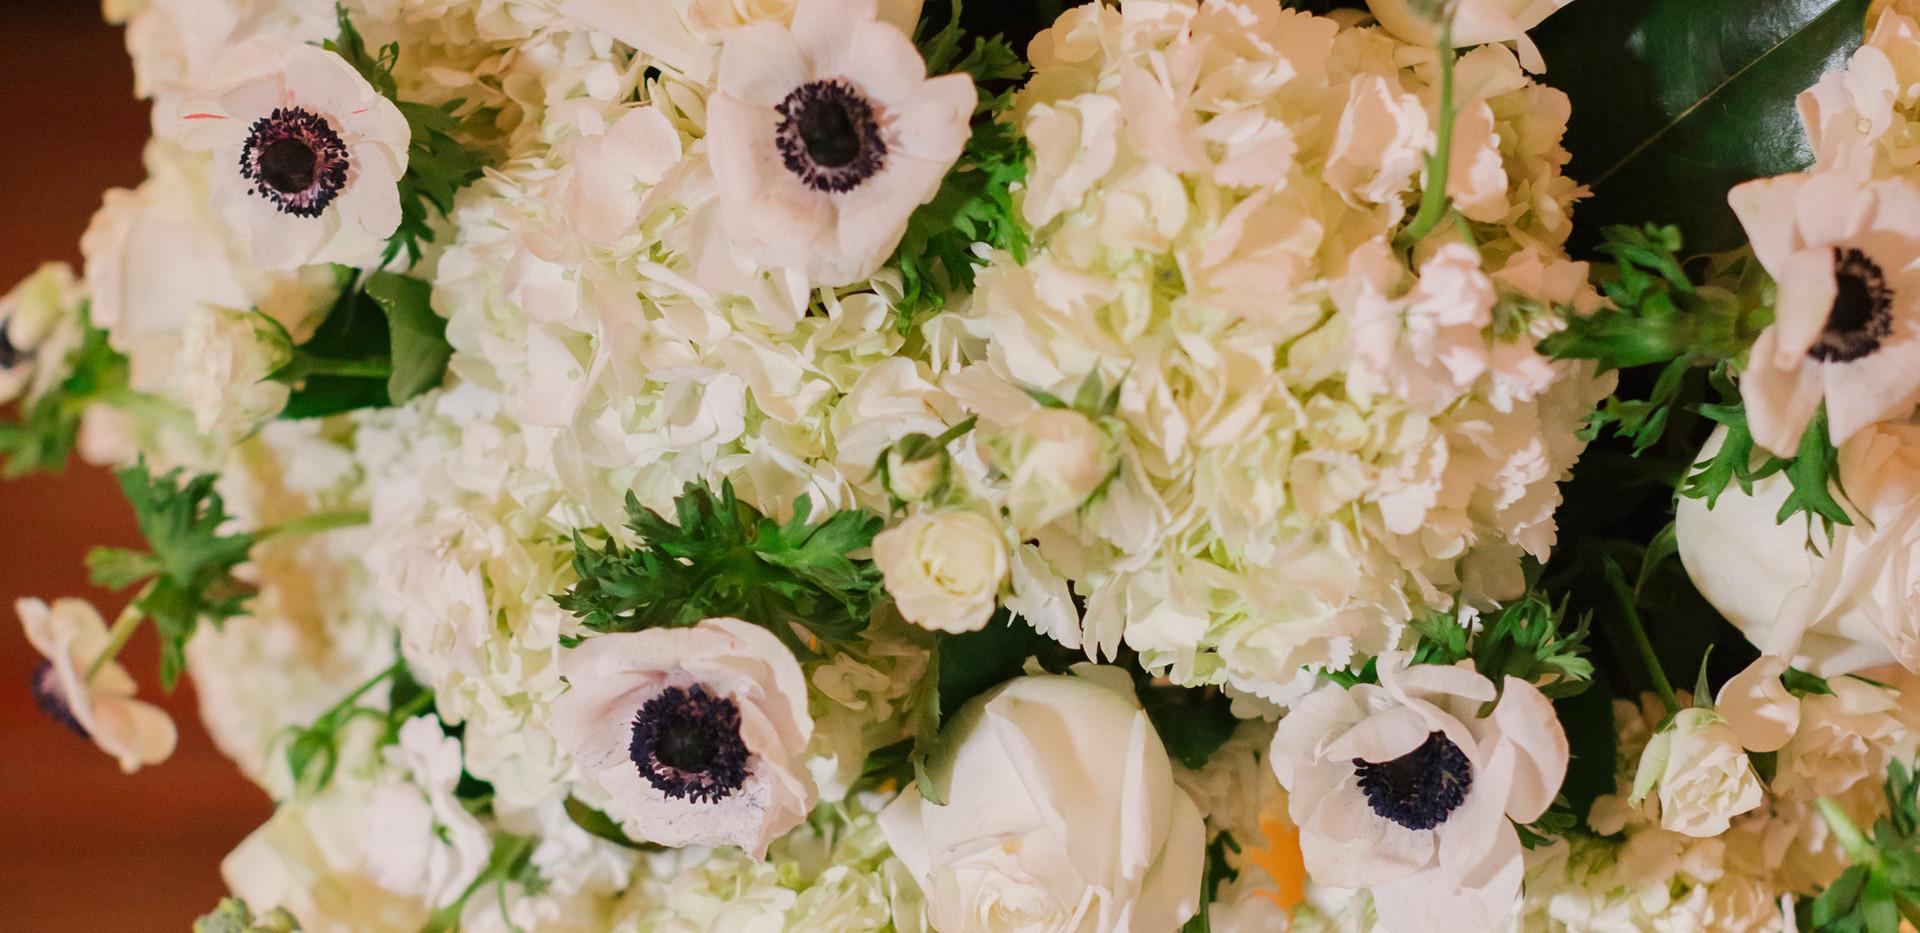 Black and White Wedding Floral Arrangements